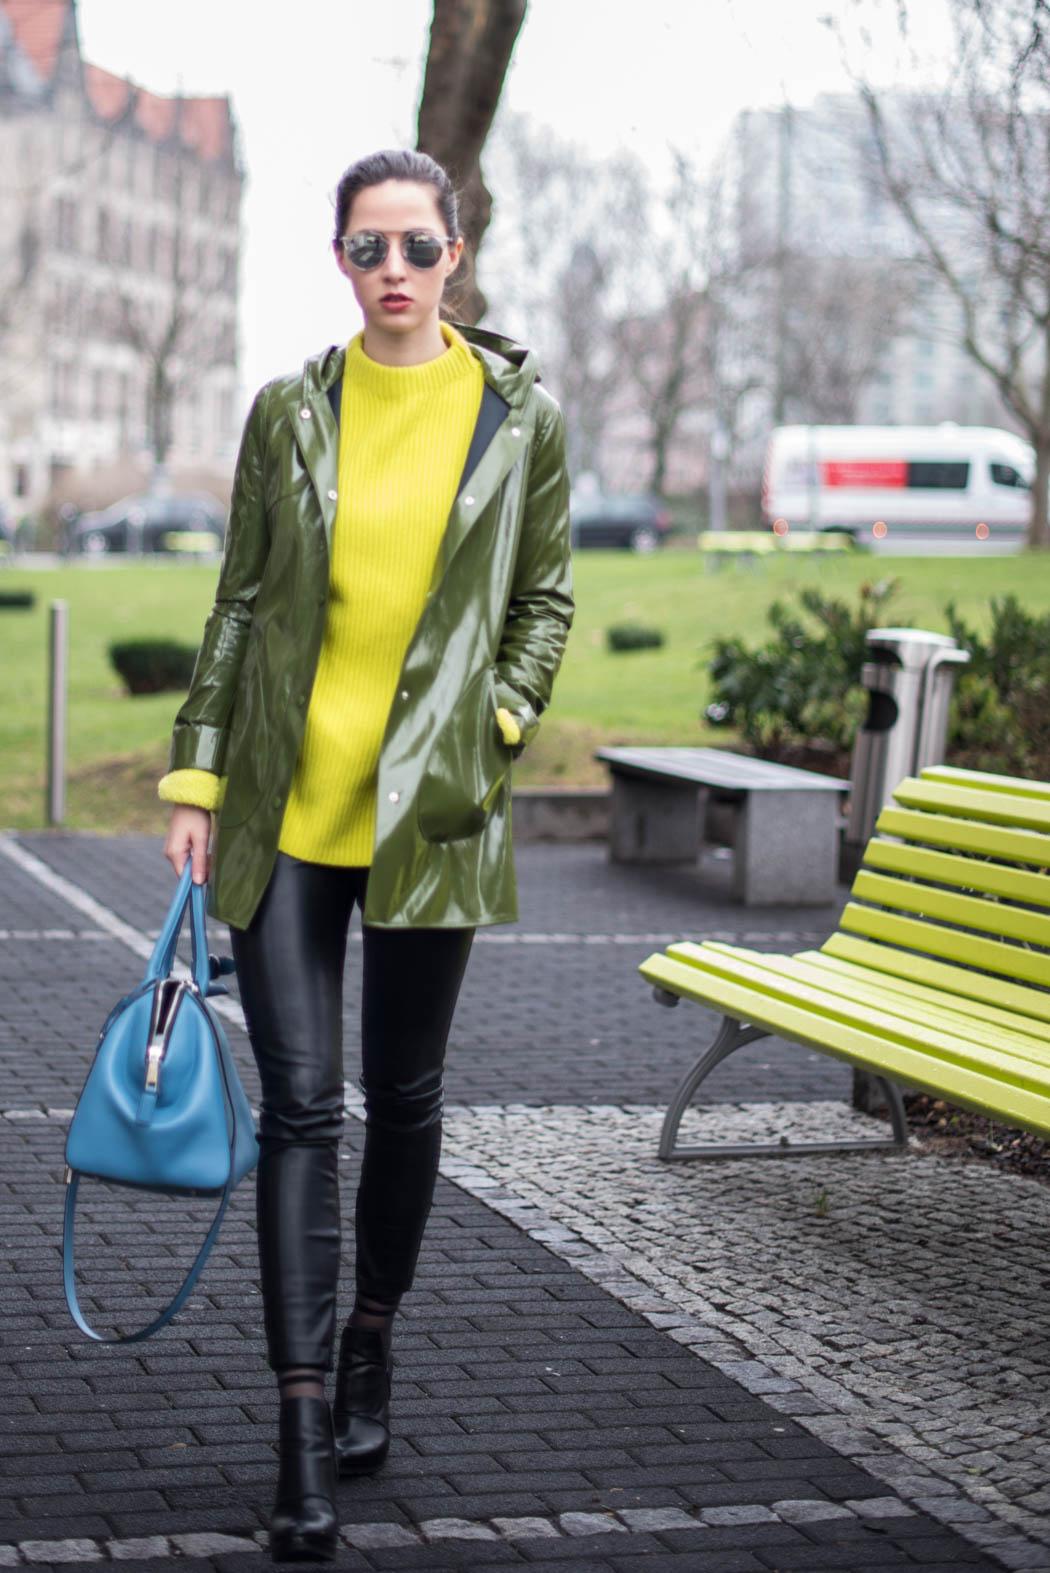 Marc-Jacobs-Sky-Incognito-Tasche-Regenmantel-Fashionblogger-München-Deutschland-Lindarella-Dior-So-Real-Berlin-2